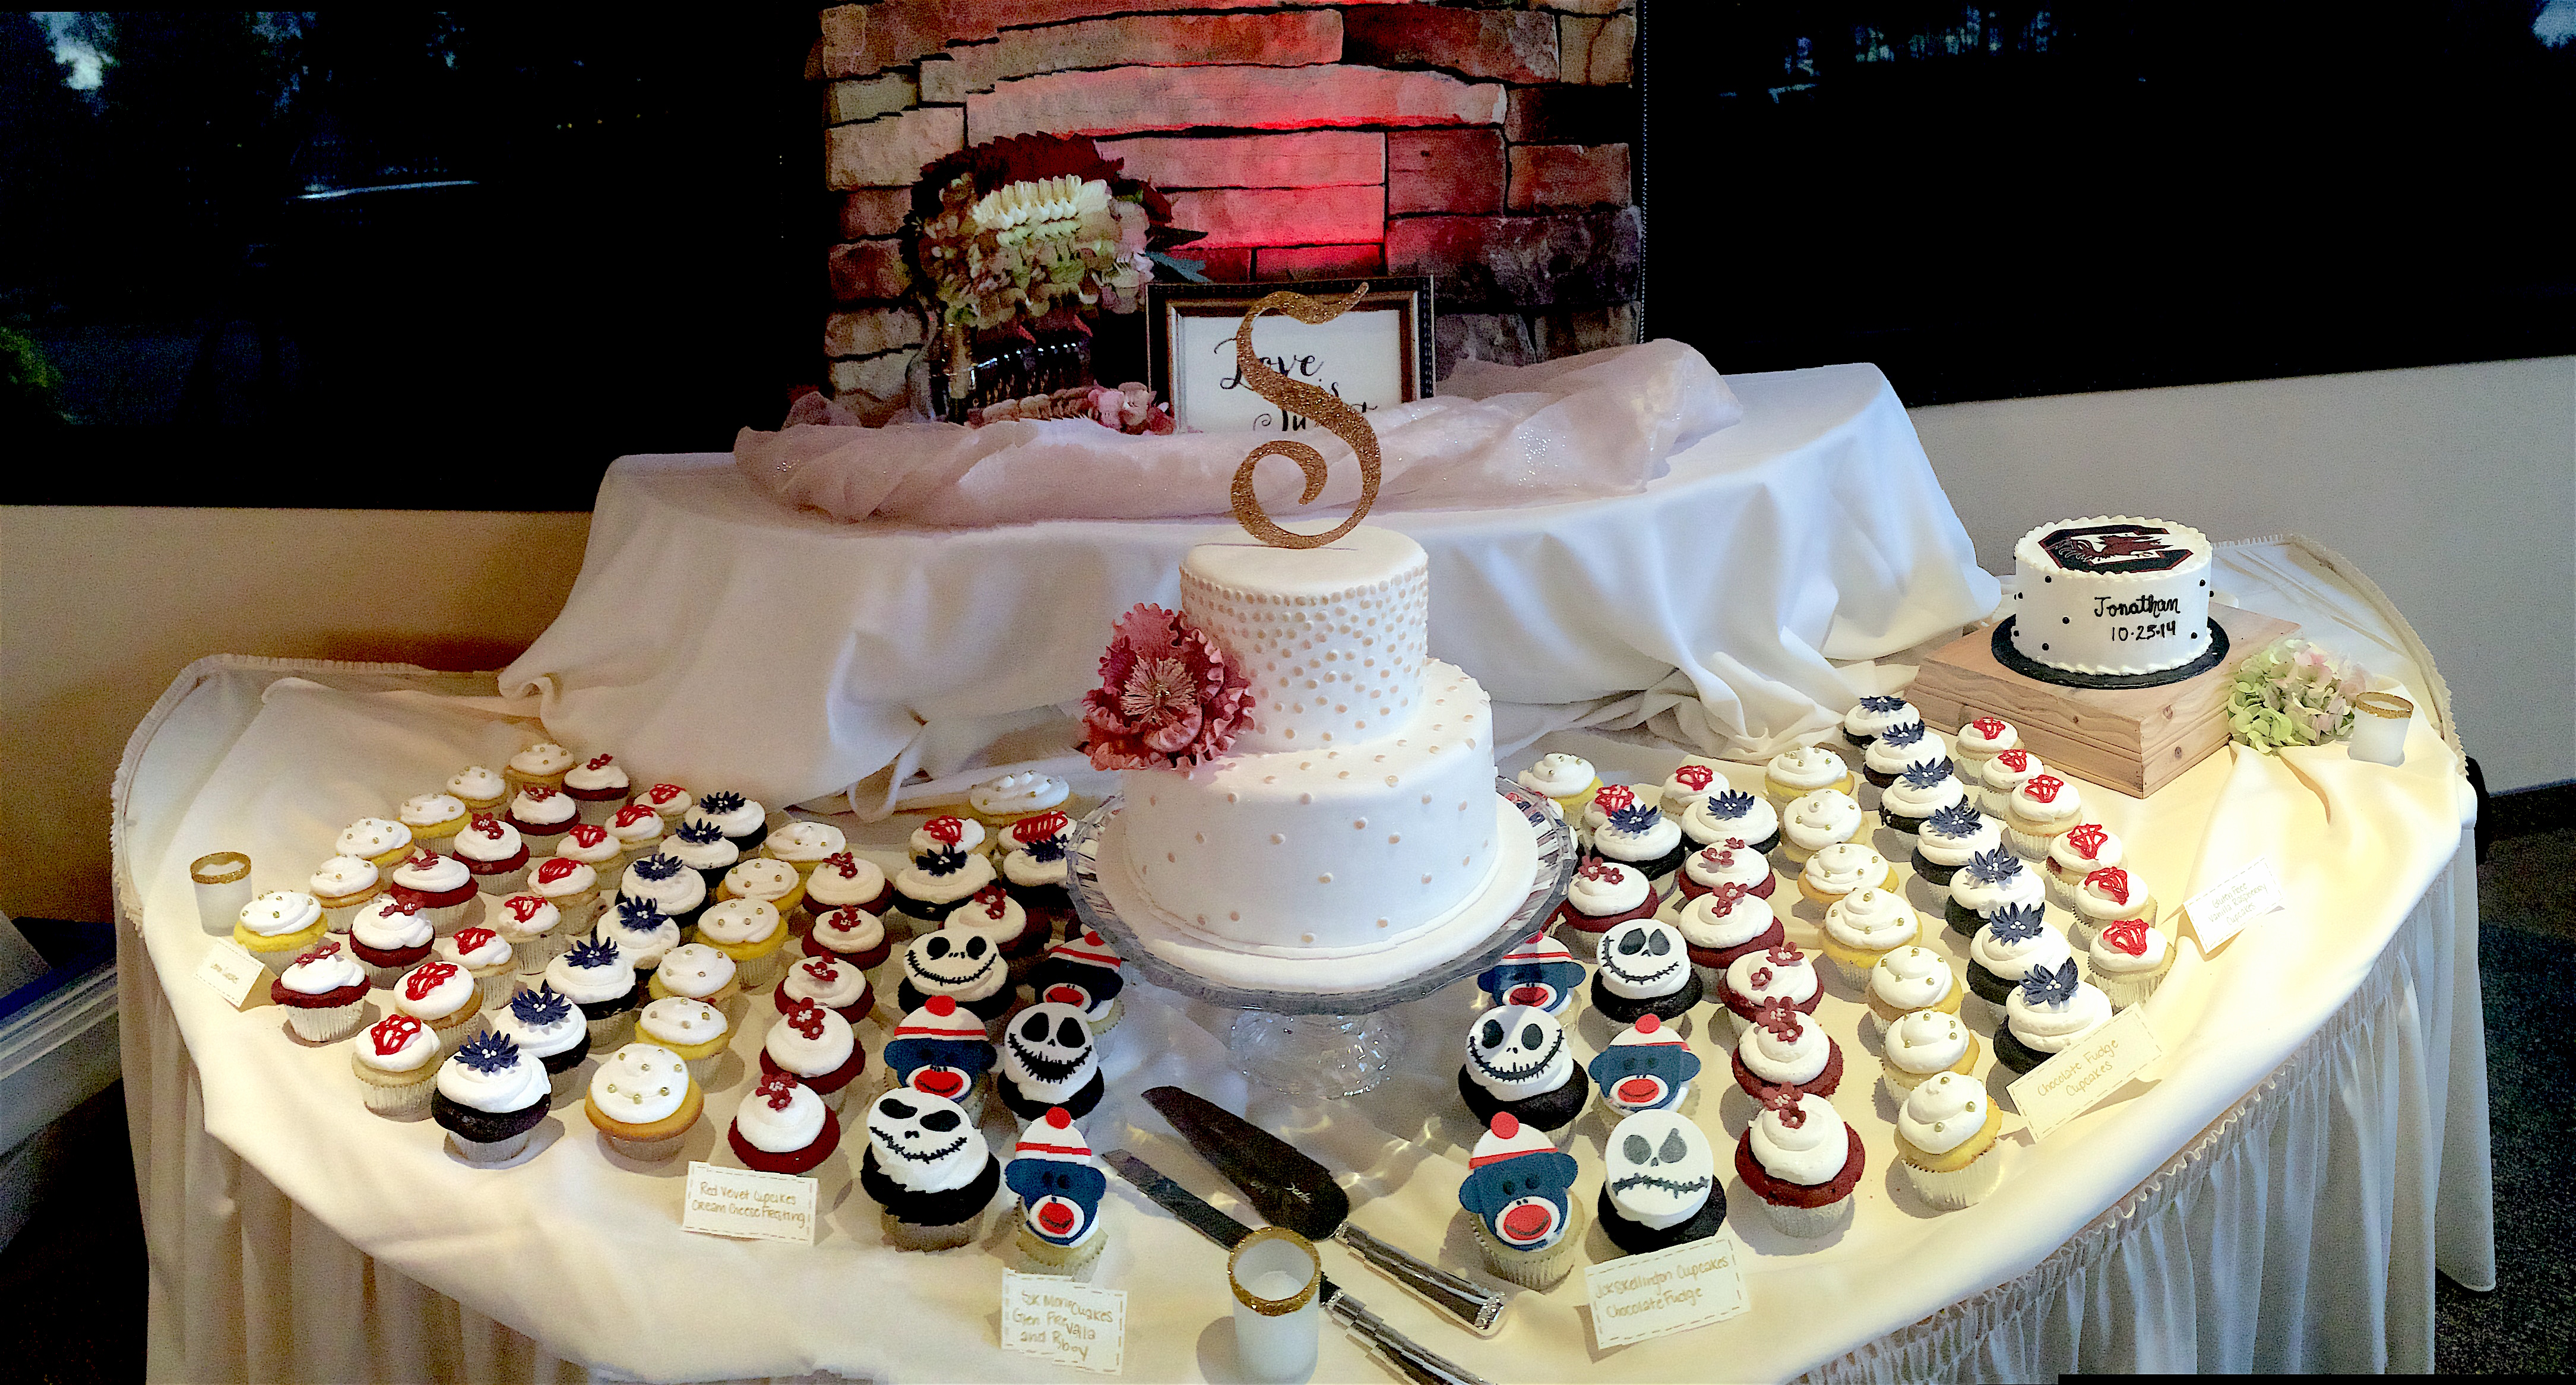 Wedding Cake wCupcakes6 Display Wide